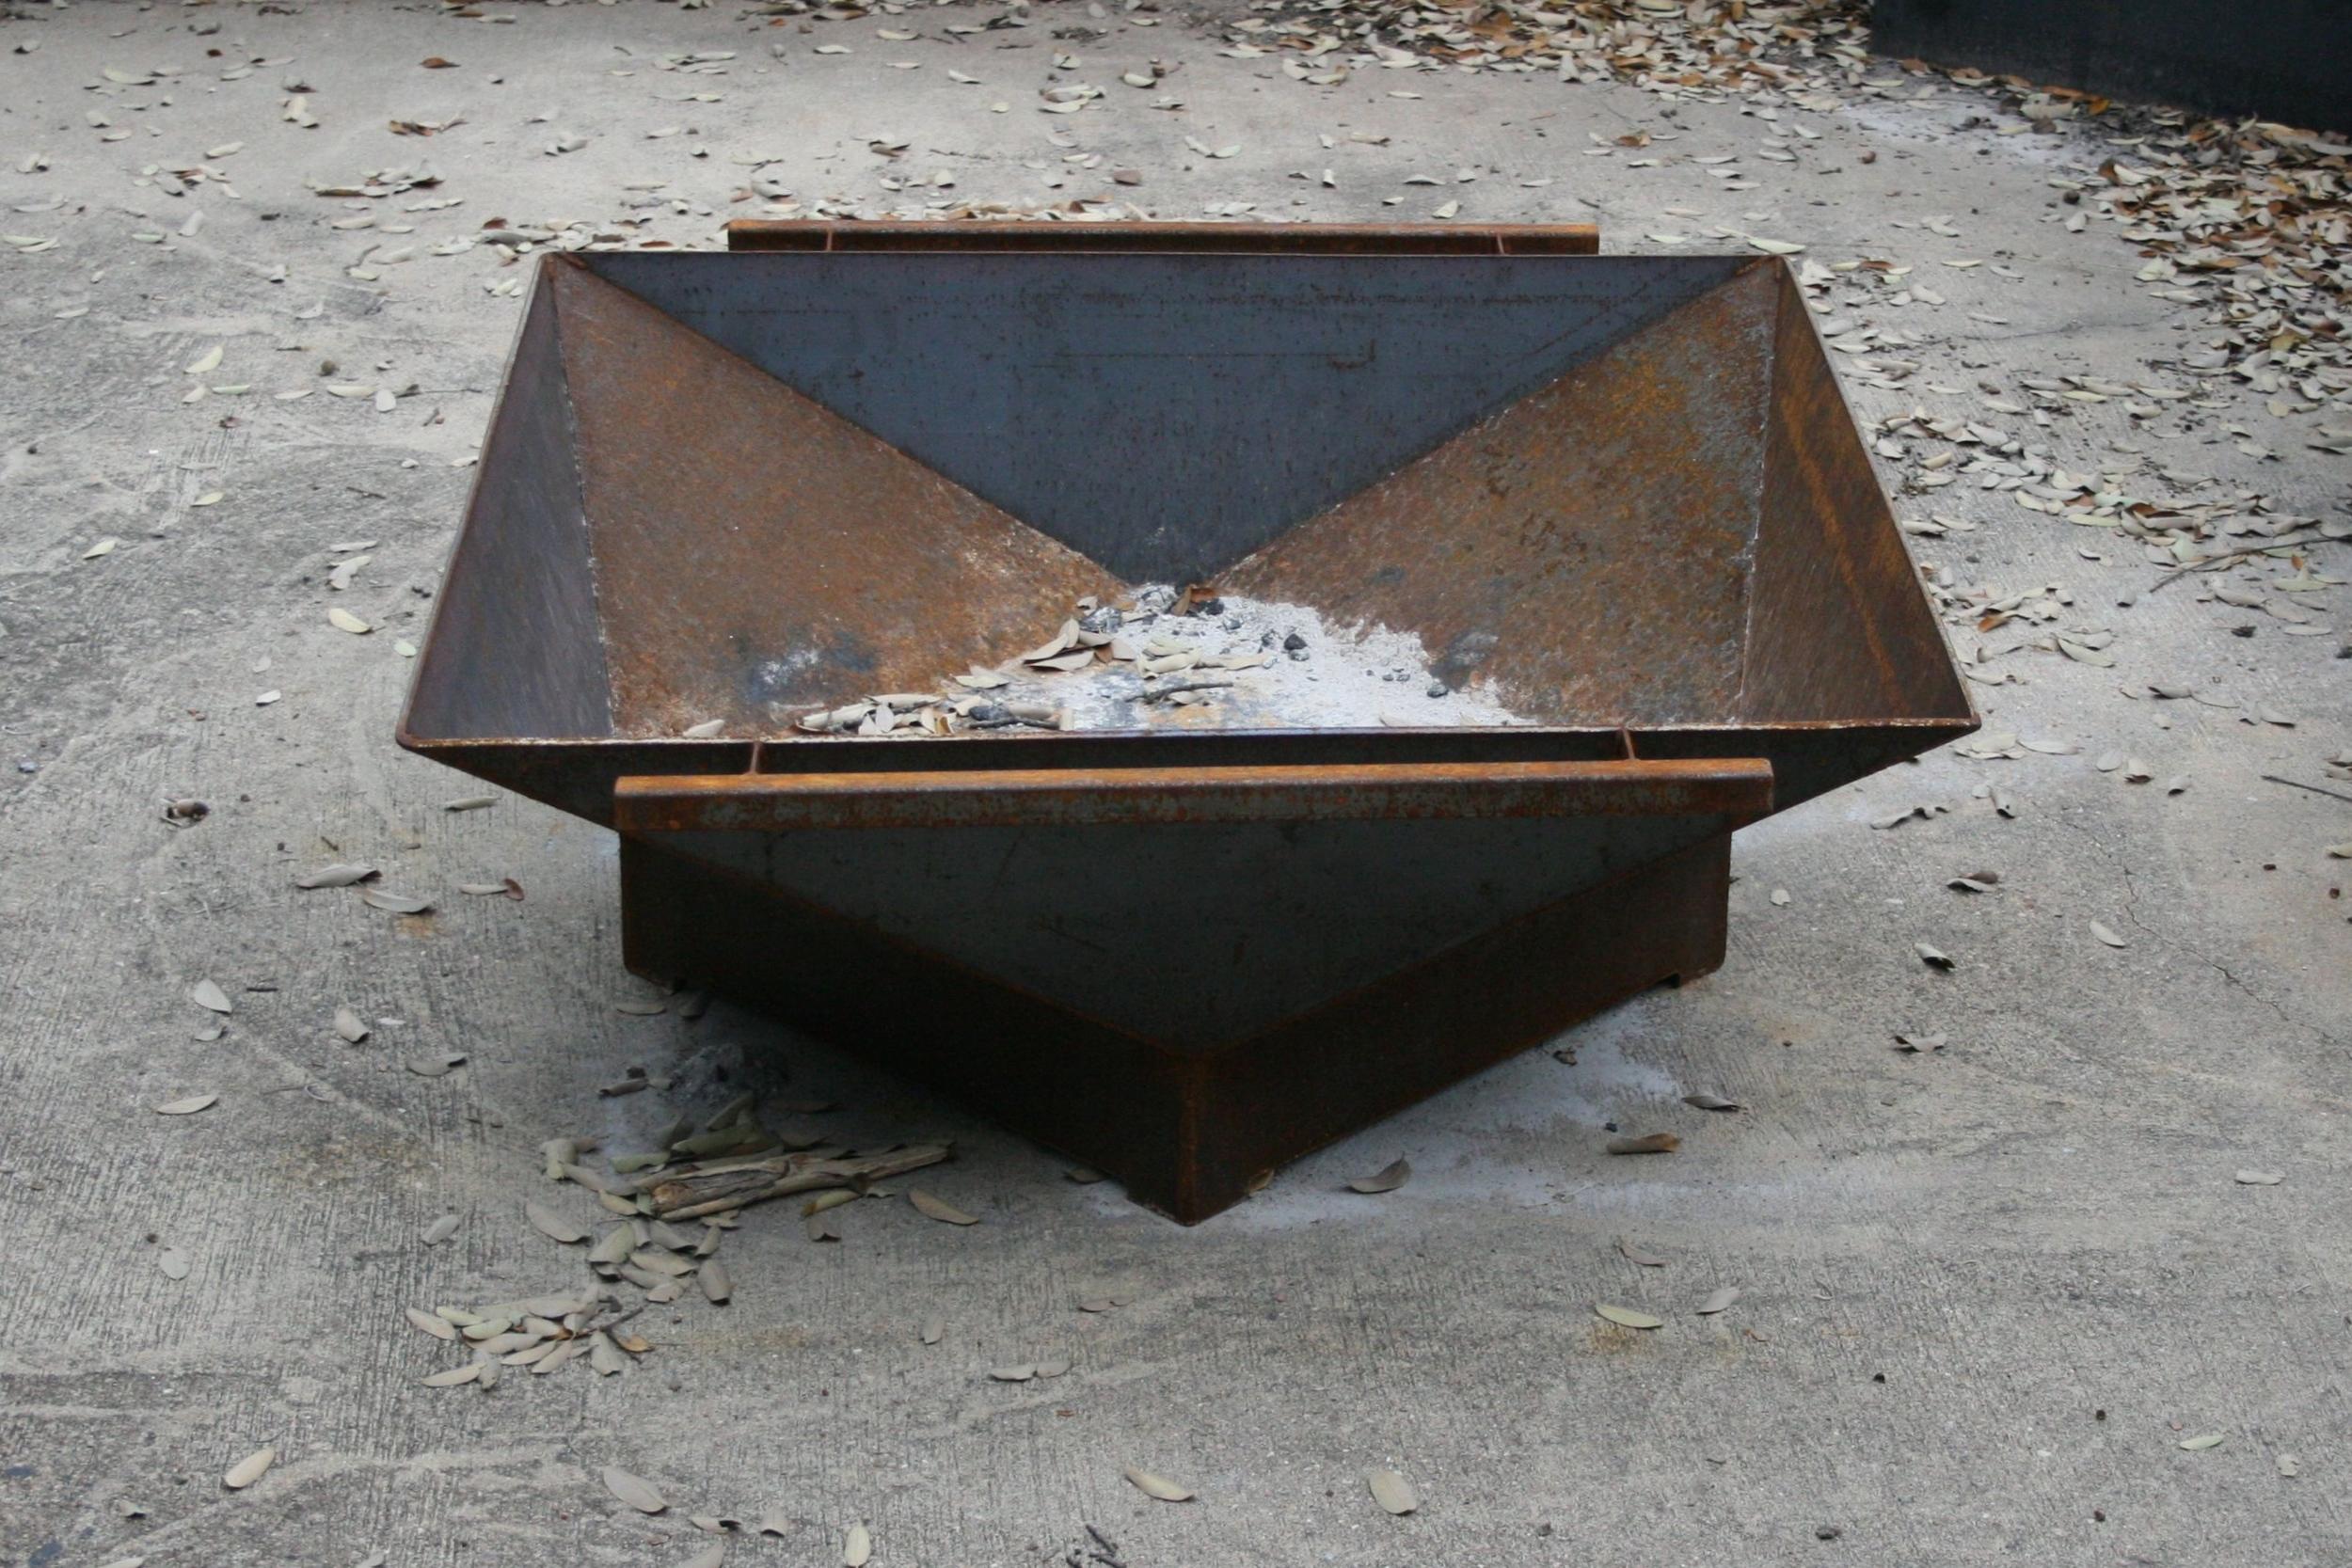 STEEL SQUARE — FIRE PIT #2 — 36 x 36 x 18